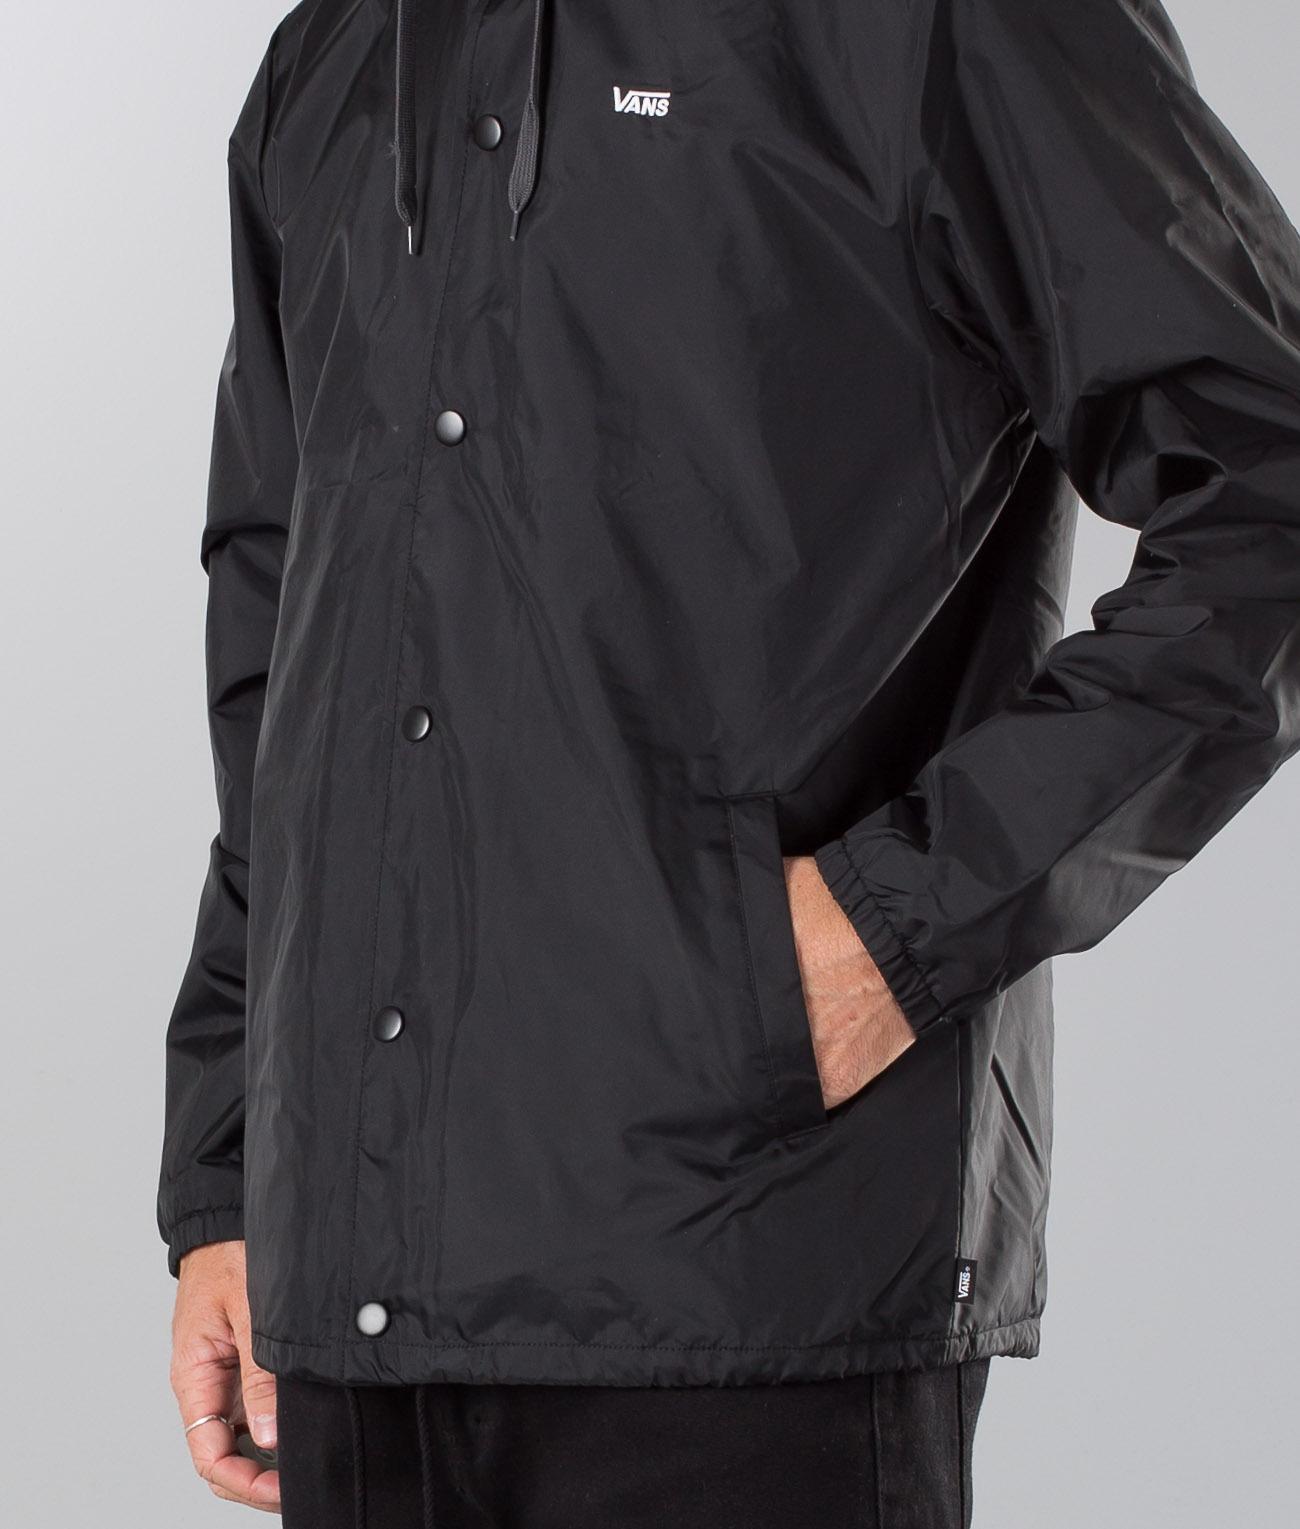 giacchetto vans